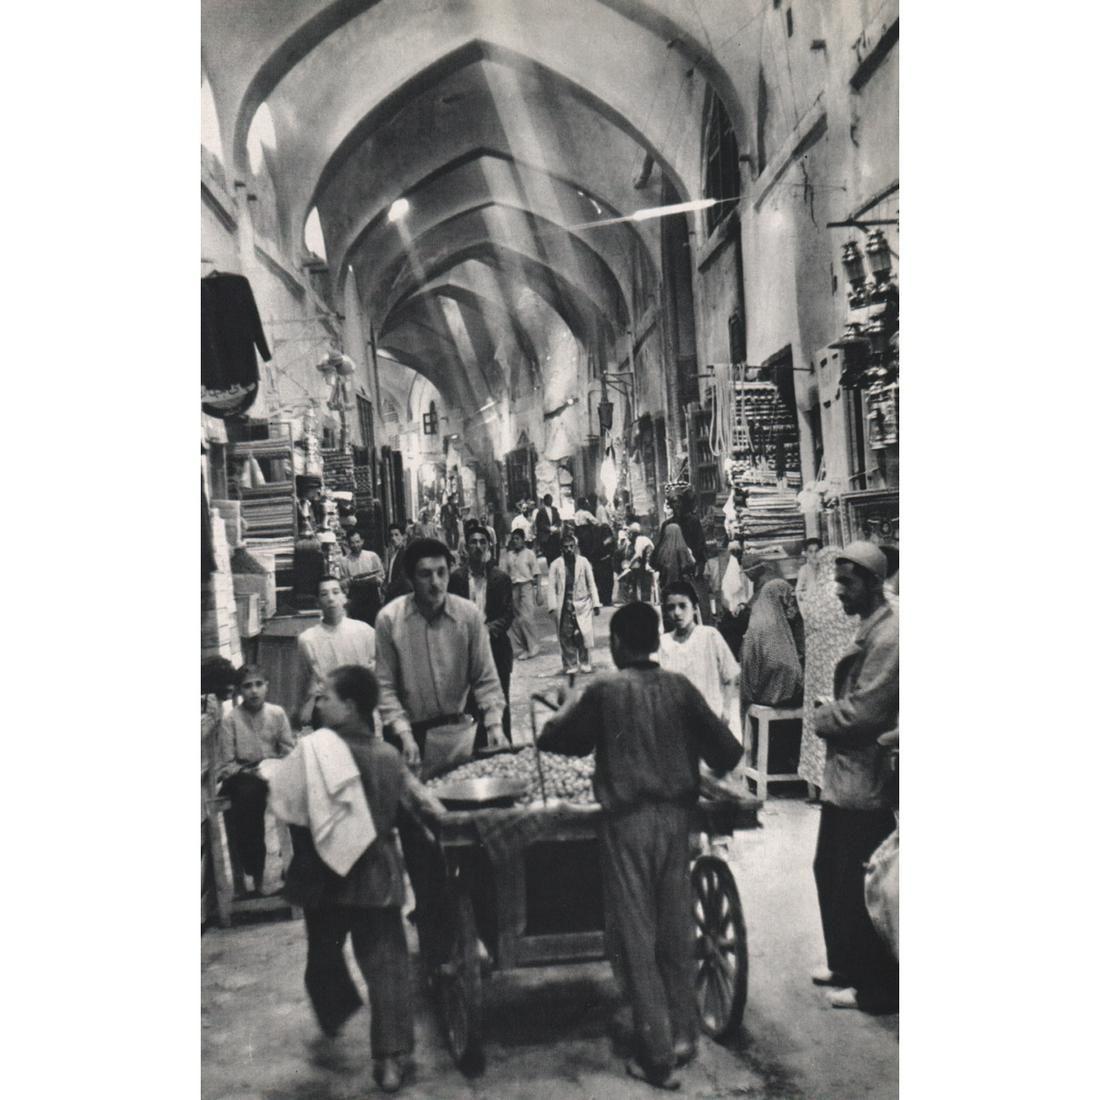 HENRI CARTIER-BRESSON - Isfahan, Iran 1950